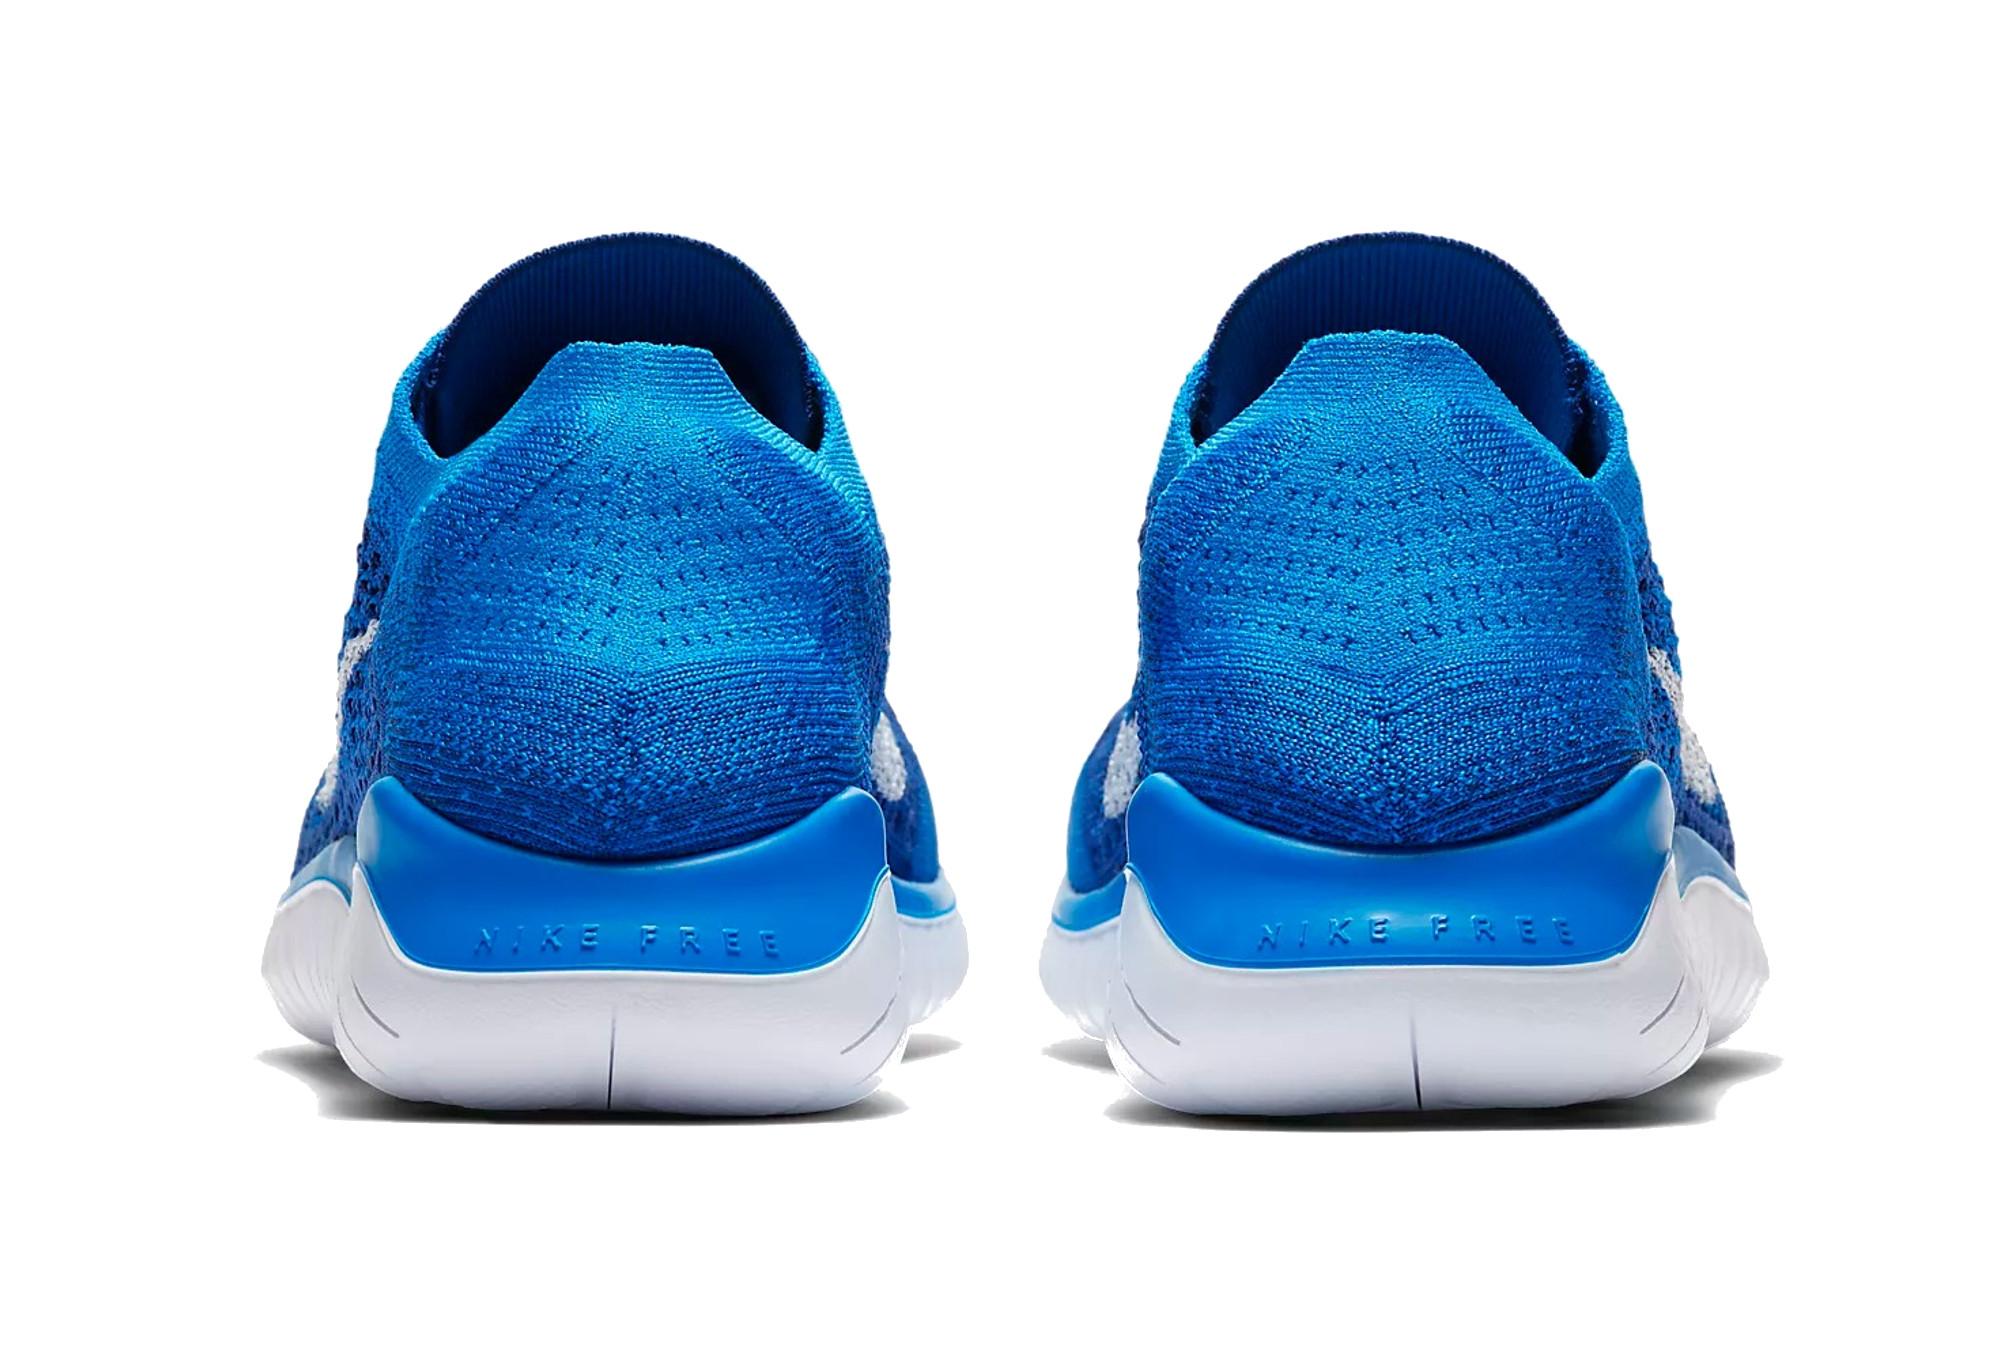 finest selection f5bf1 7b050 Zapatillas Nike Free RN Flyknit 2018 para Hombre Azul / Blanco